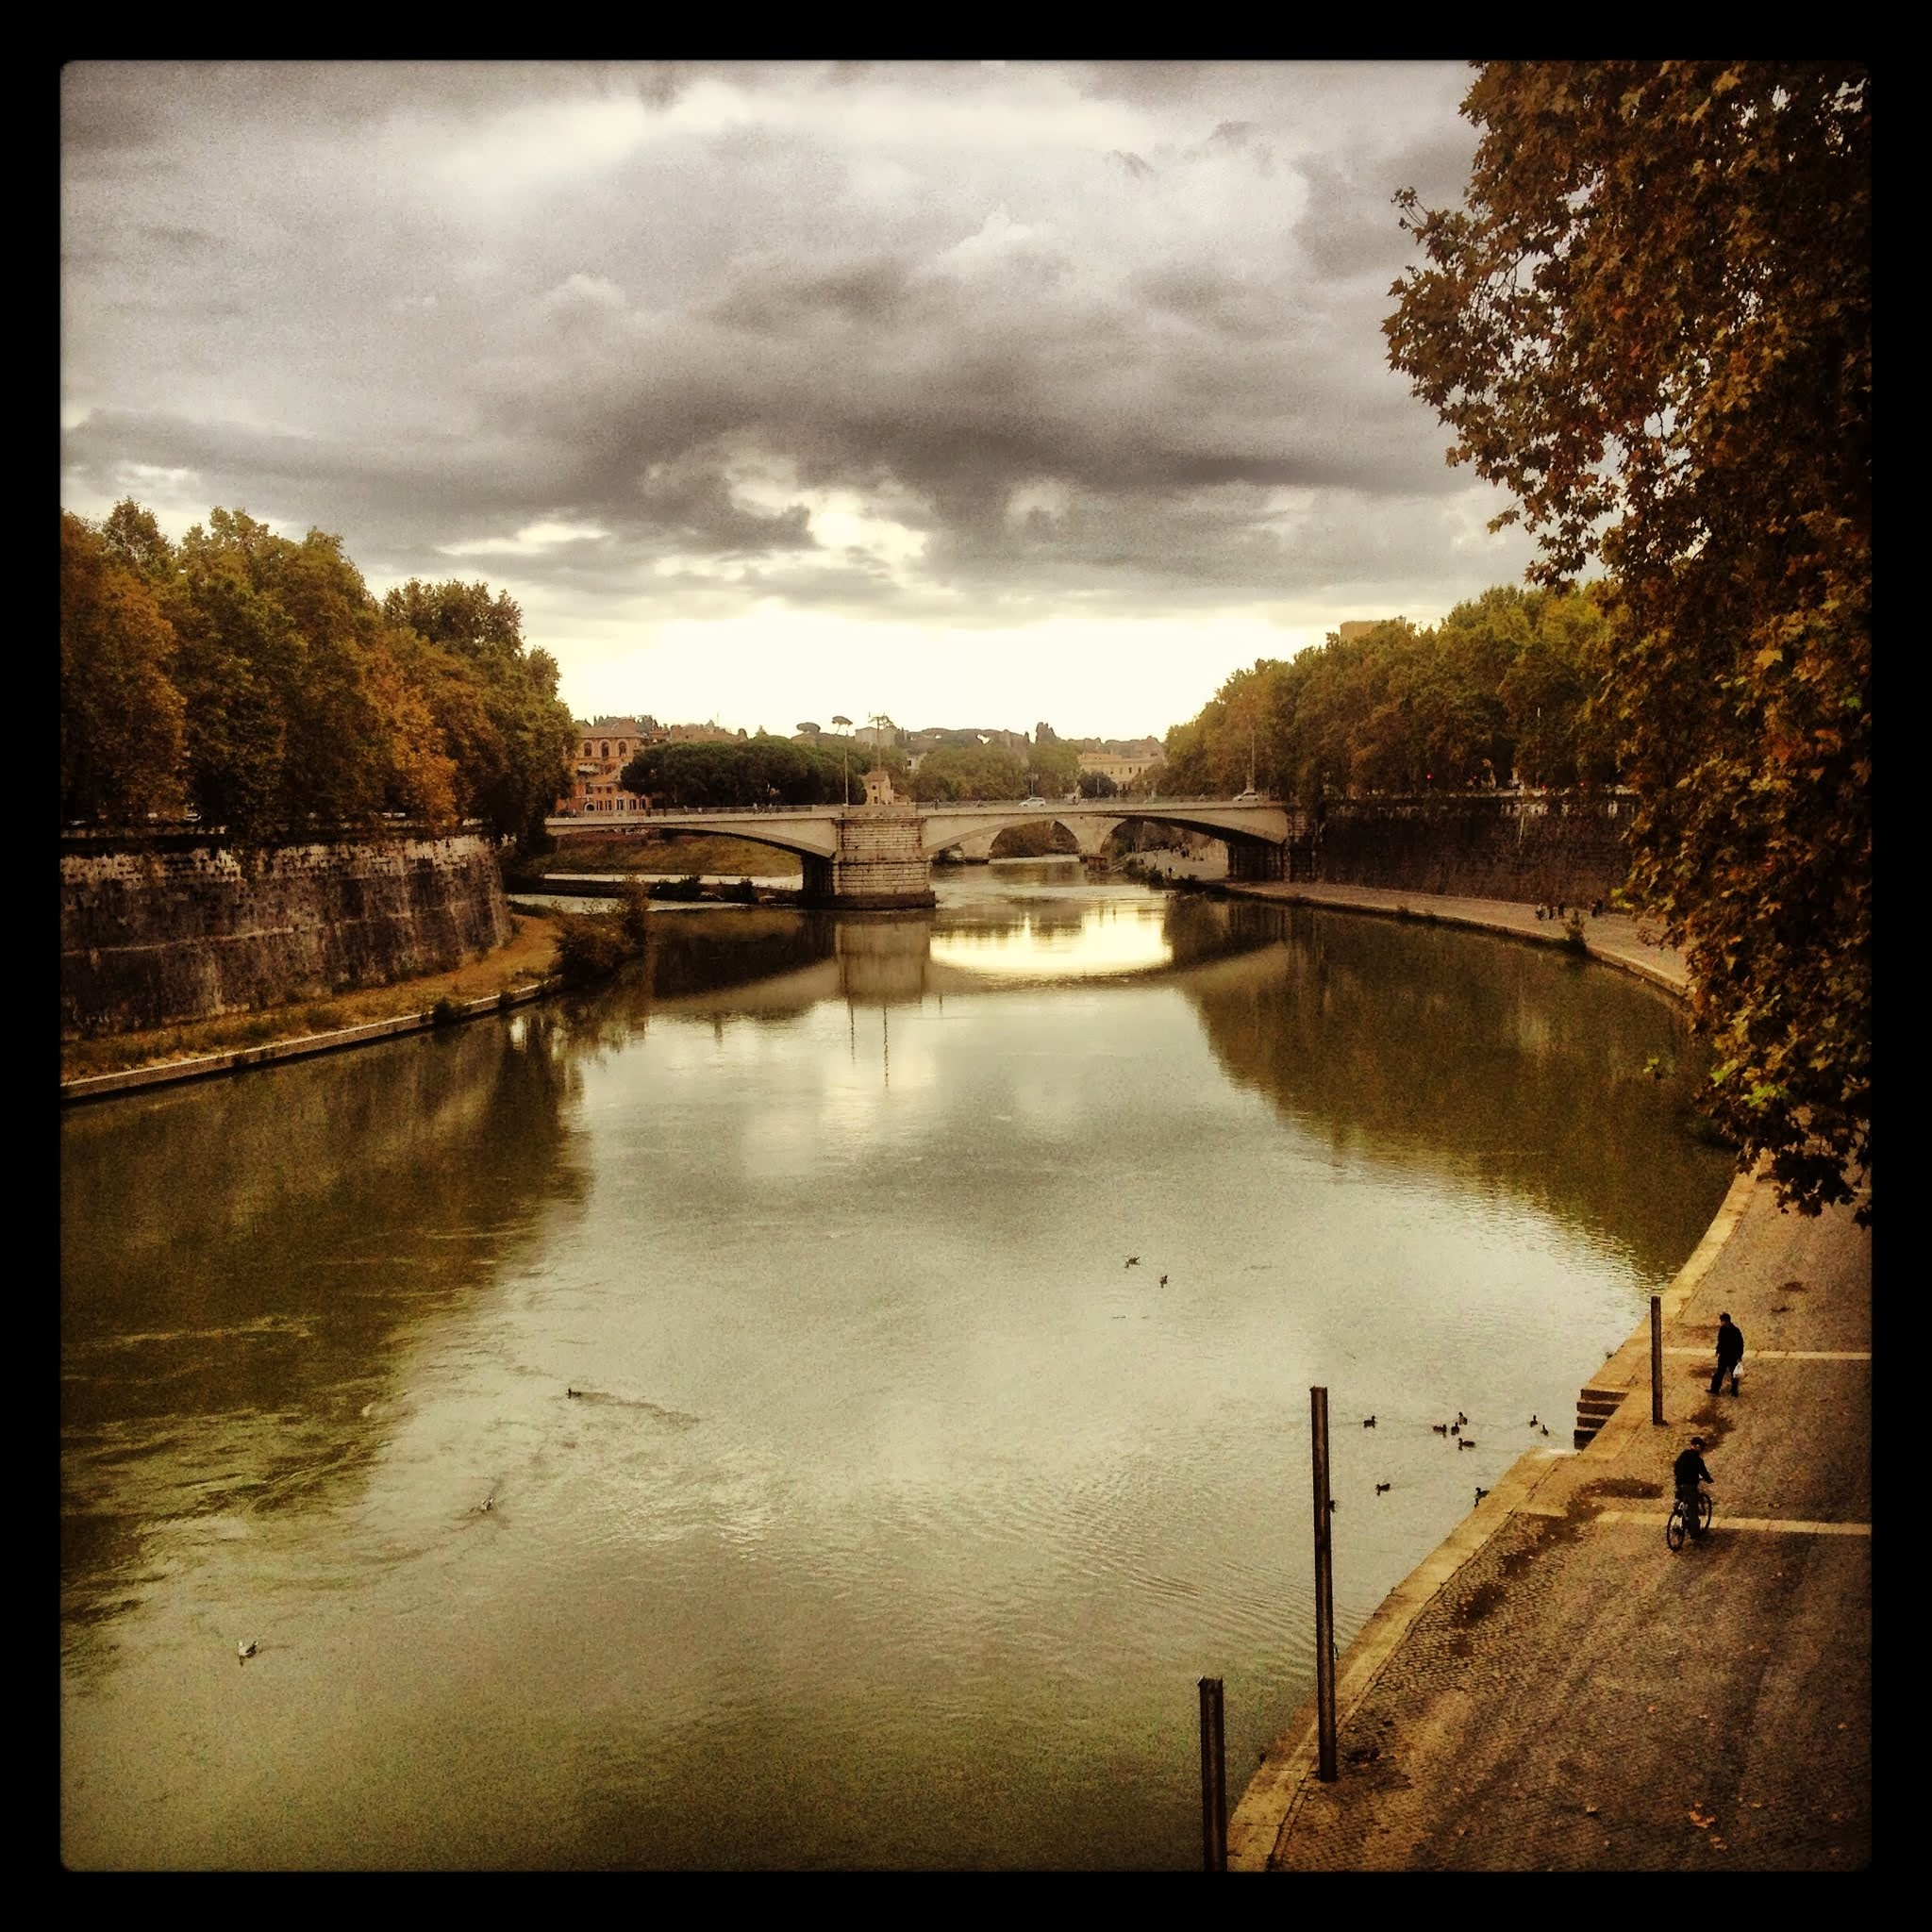 Crossing a Bridge in Rome